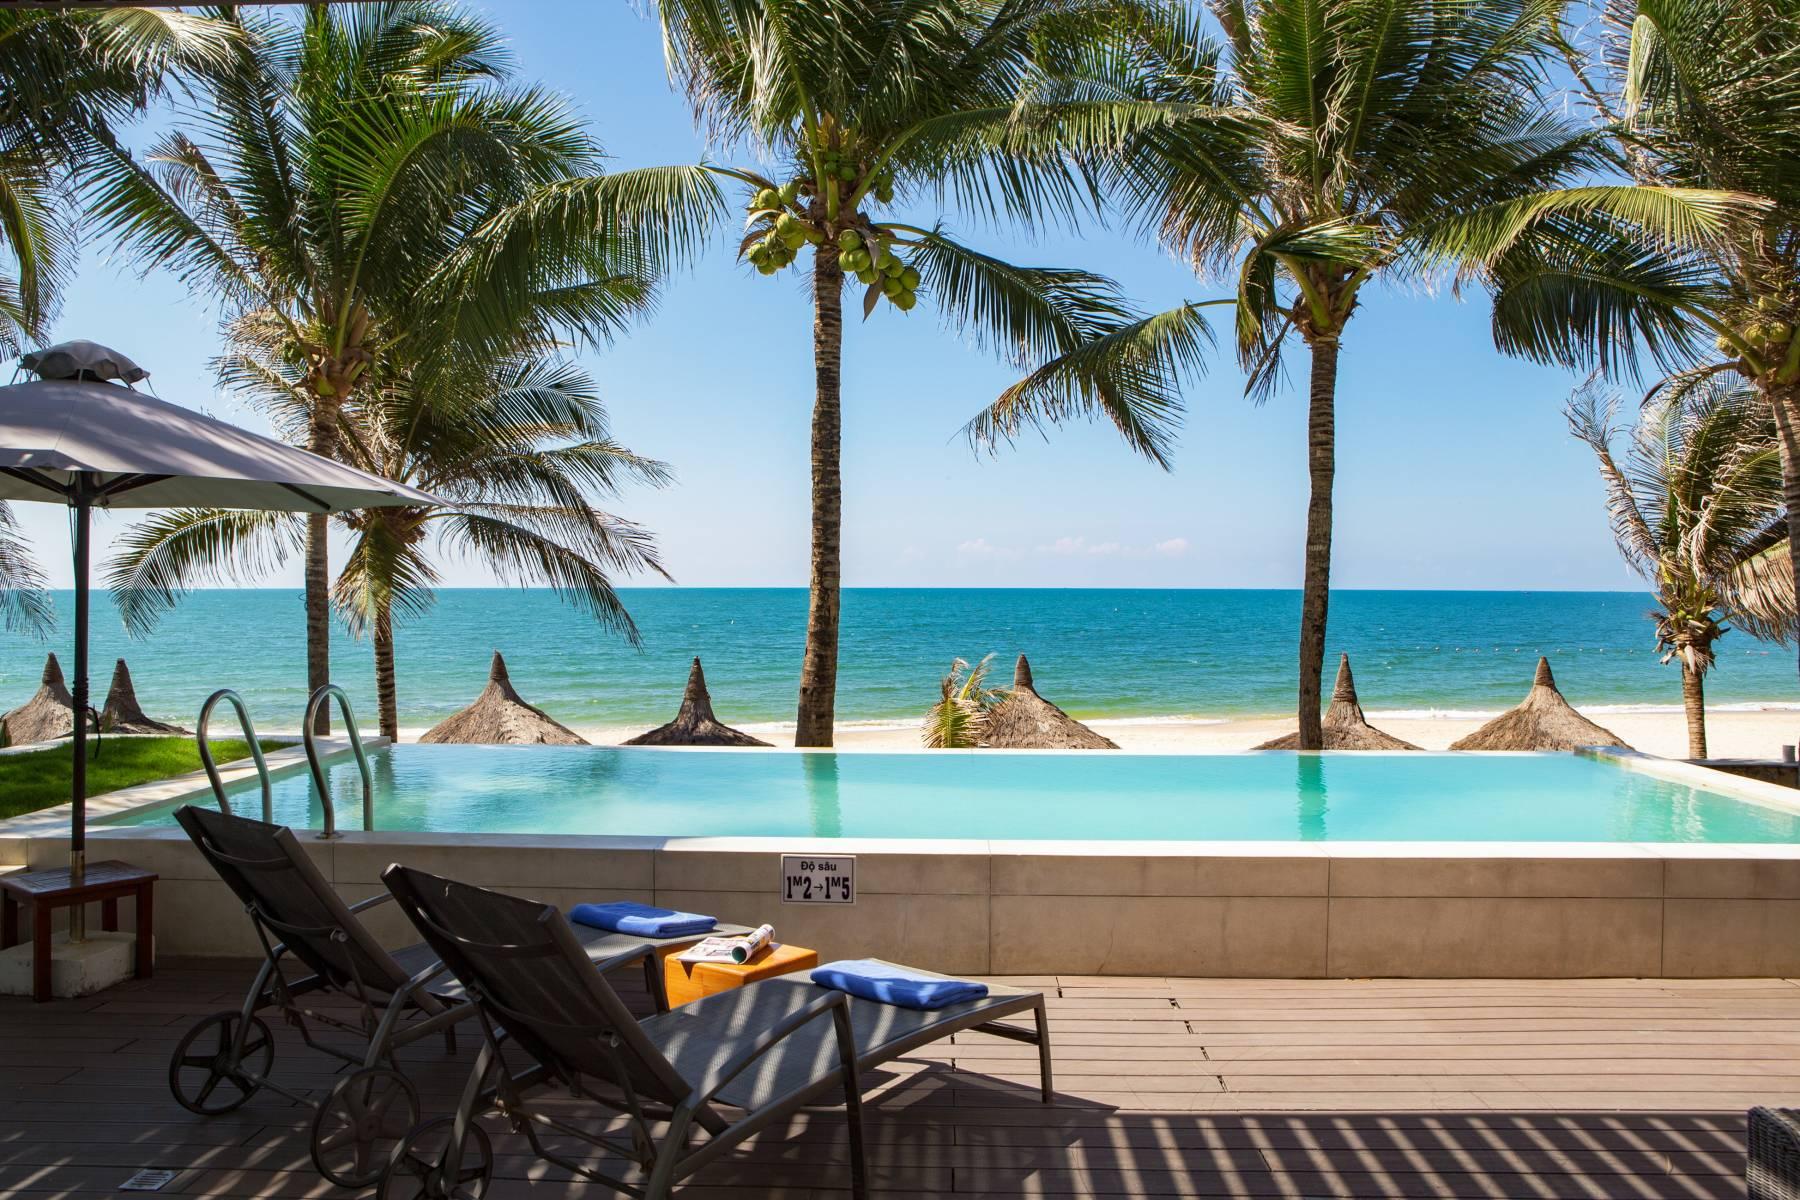 villa ocean front view